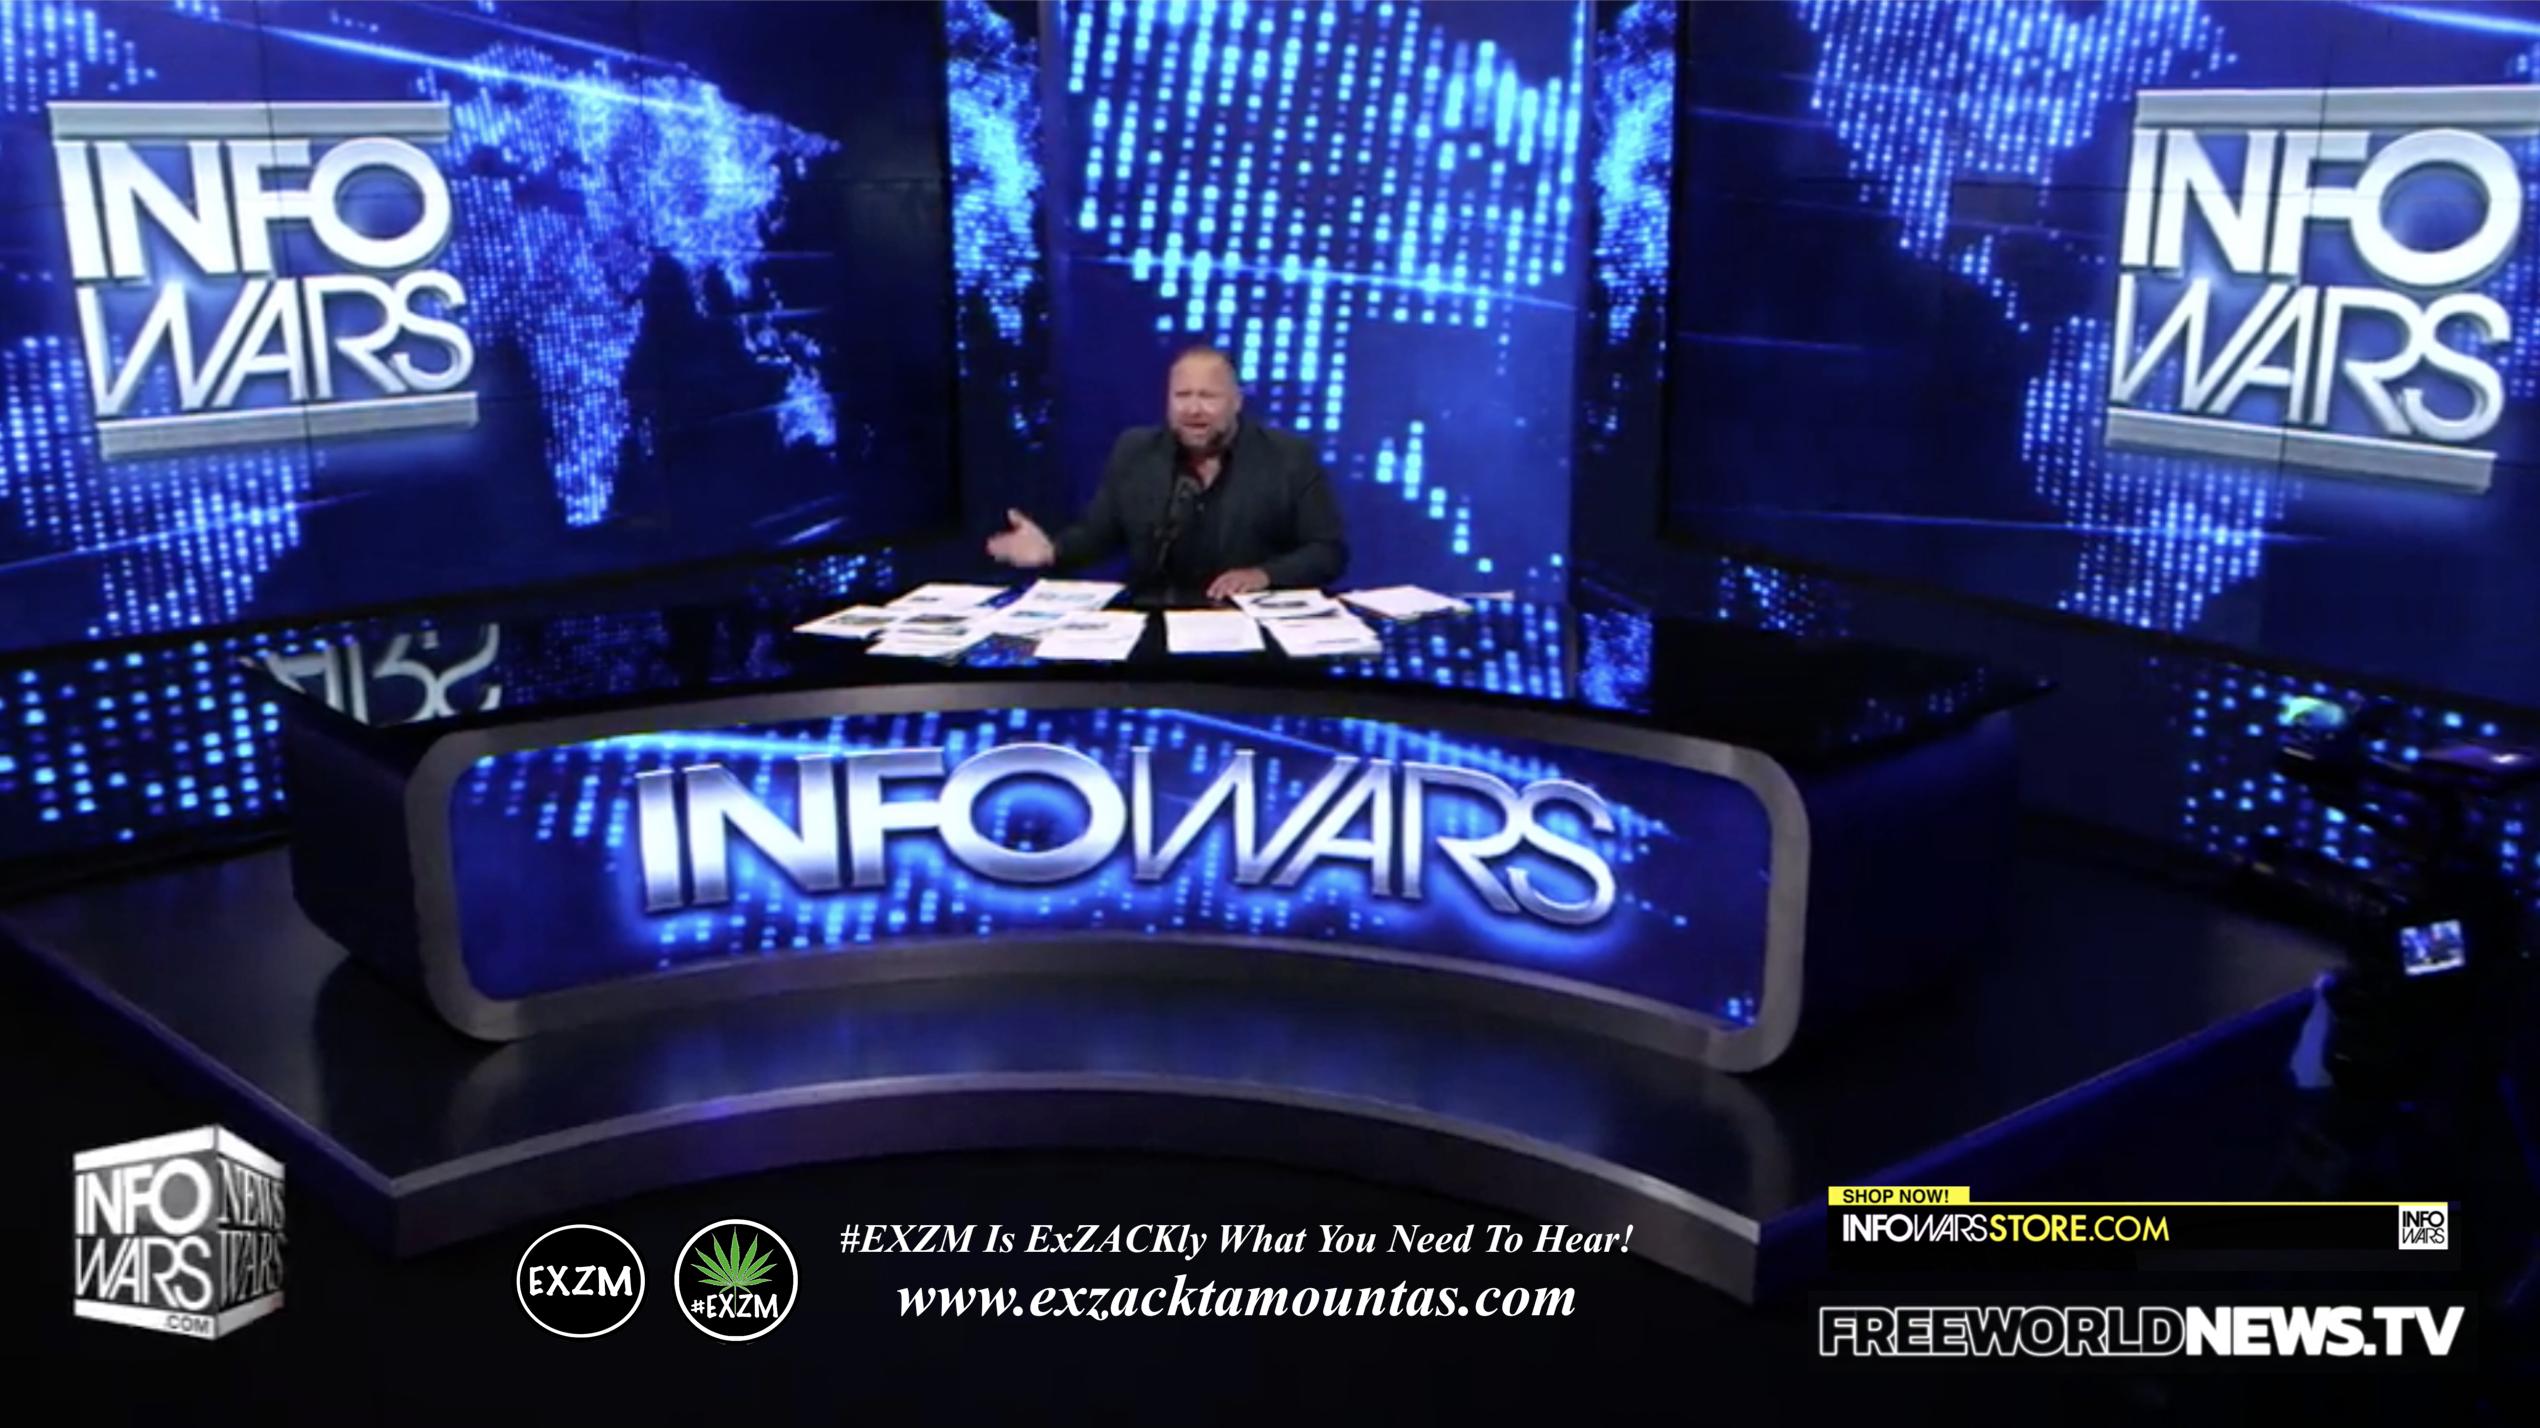 Alex Jones Live In Infowars Studio Free World News TV EXZM Zack Mount July 13th 2021 copy